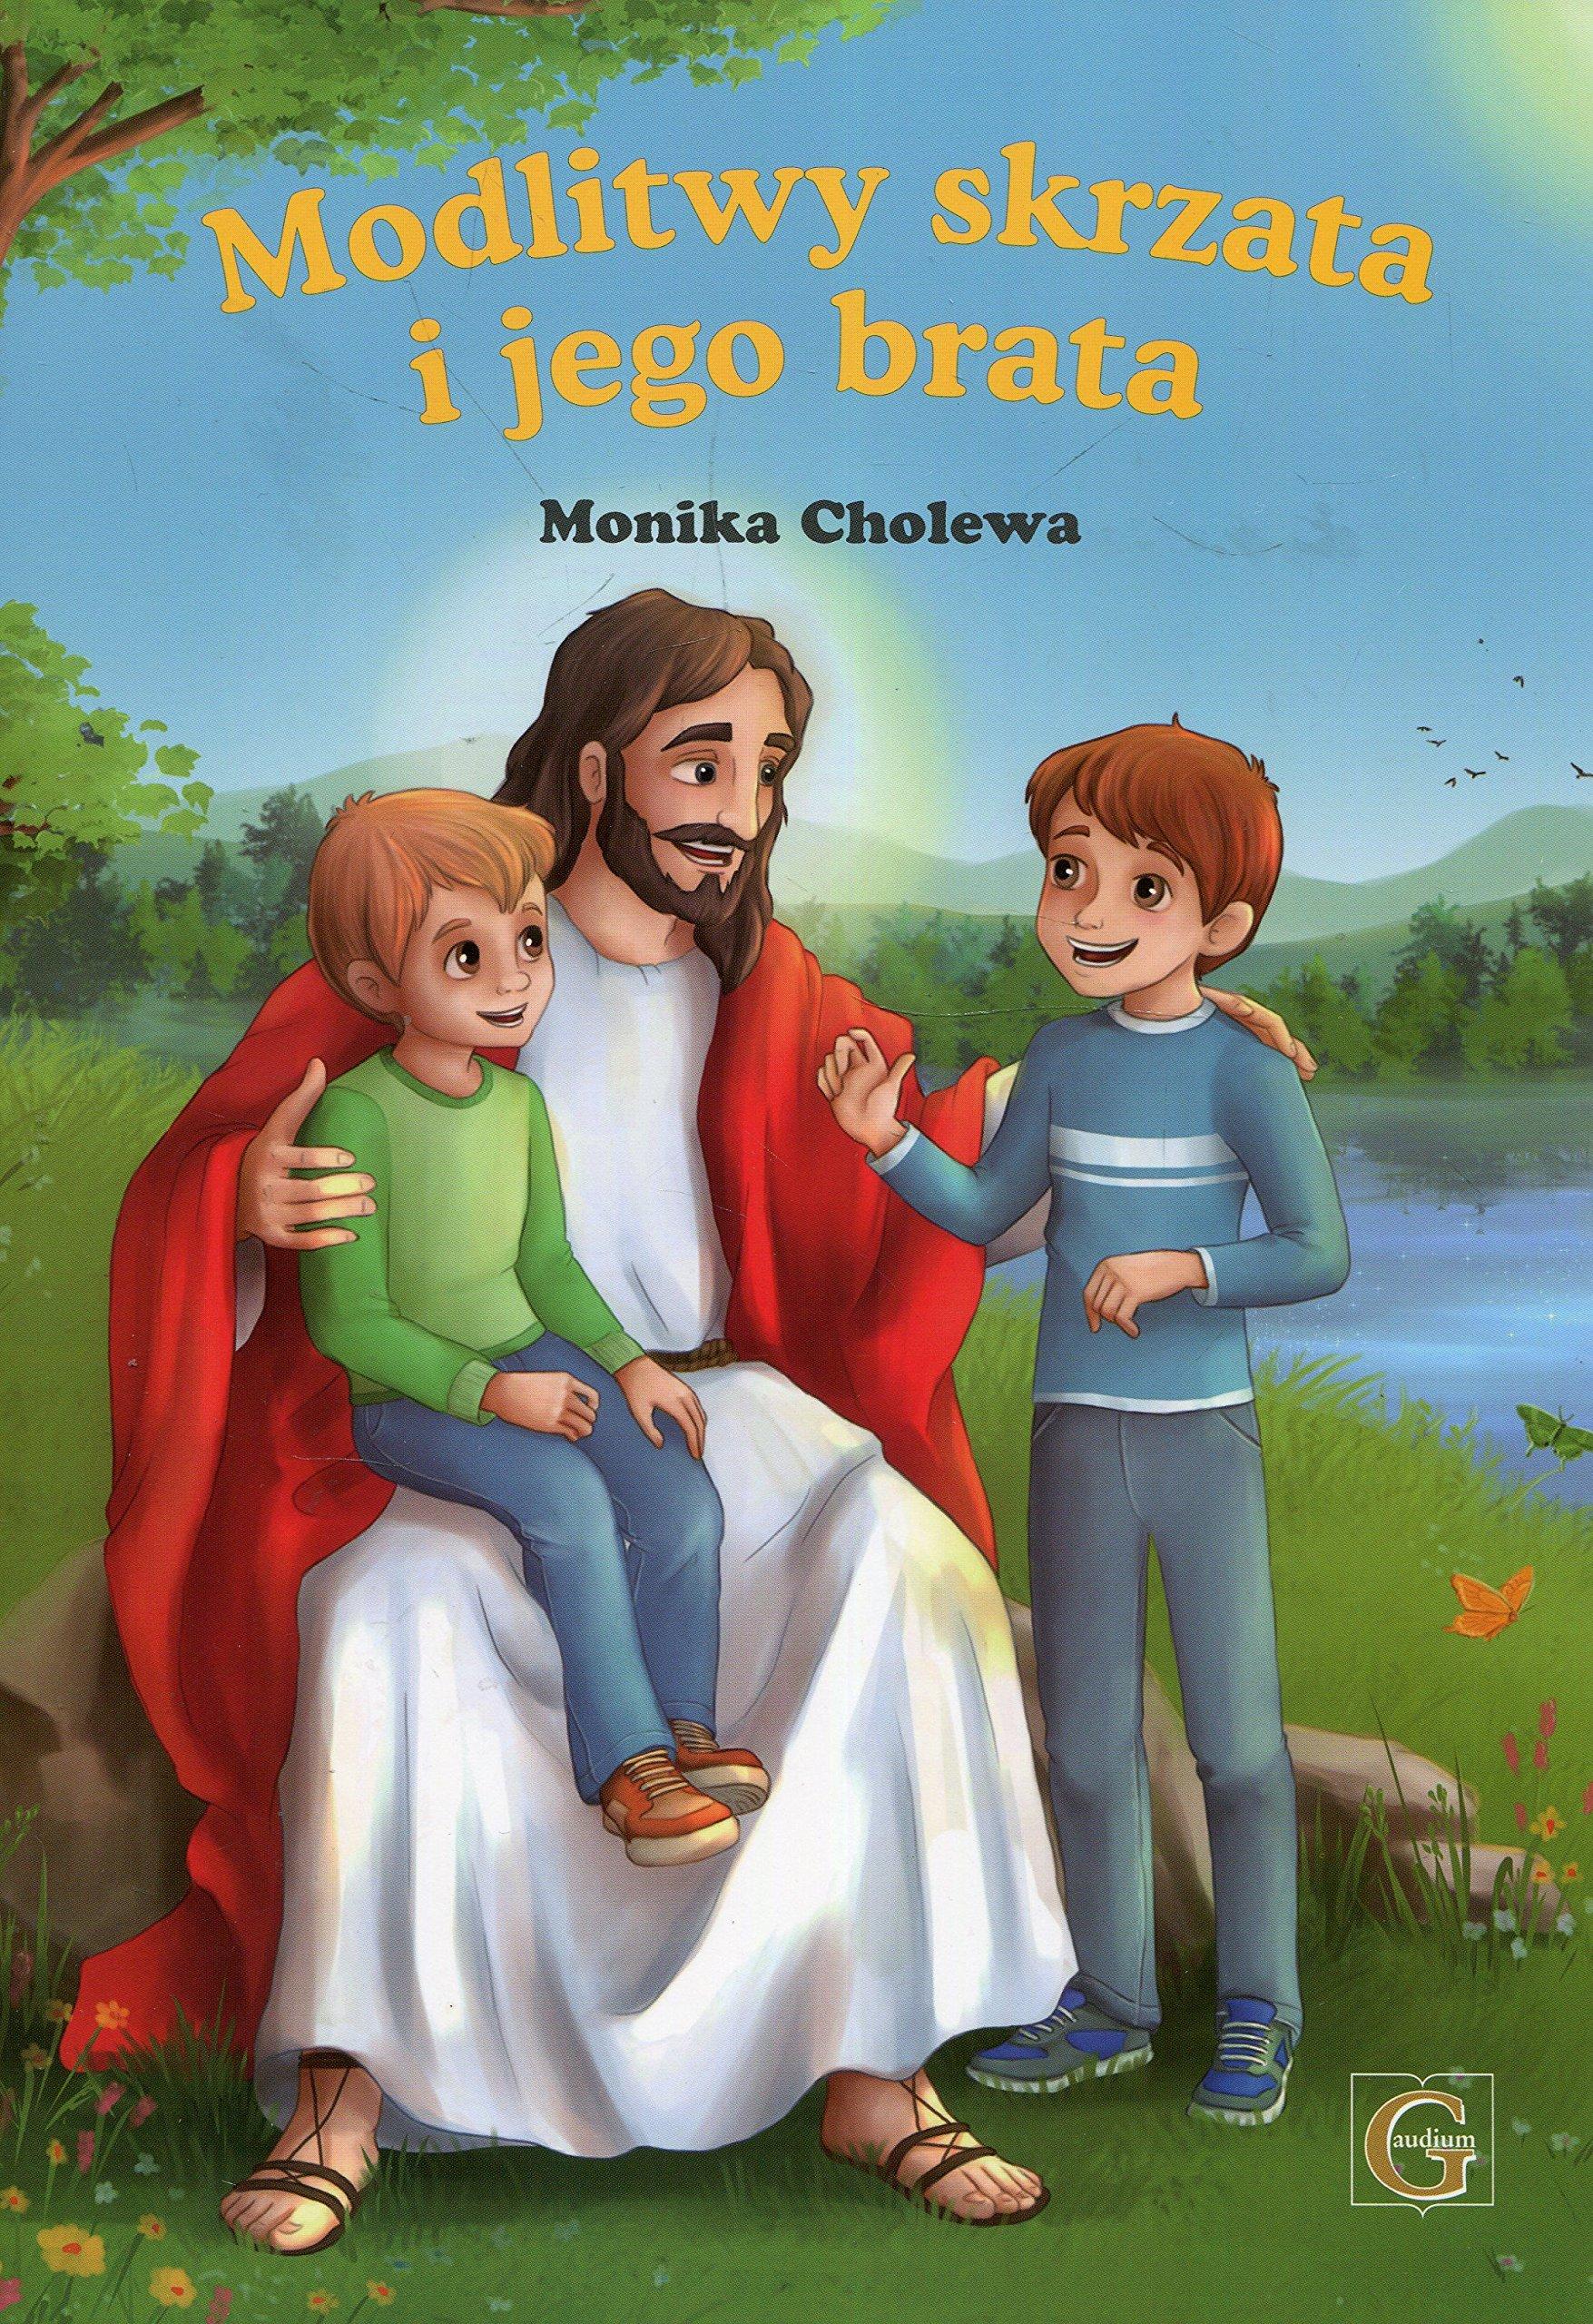 Amazon.fr - Modlitwy skrzata i jego brata - Monika Cholewa - Livres